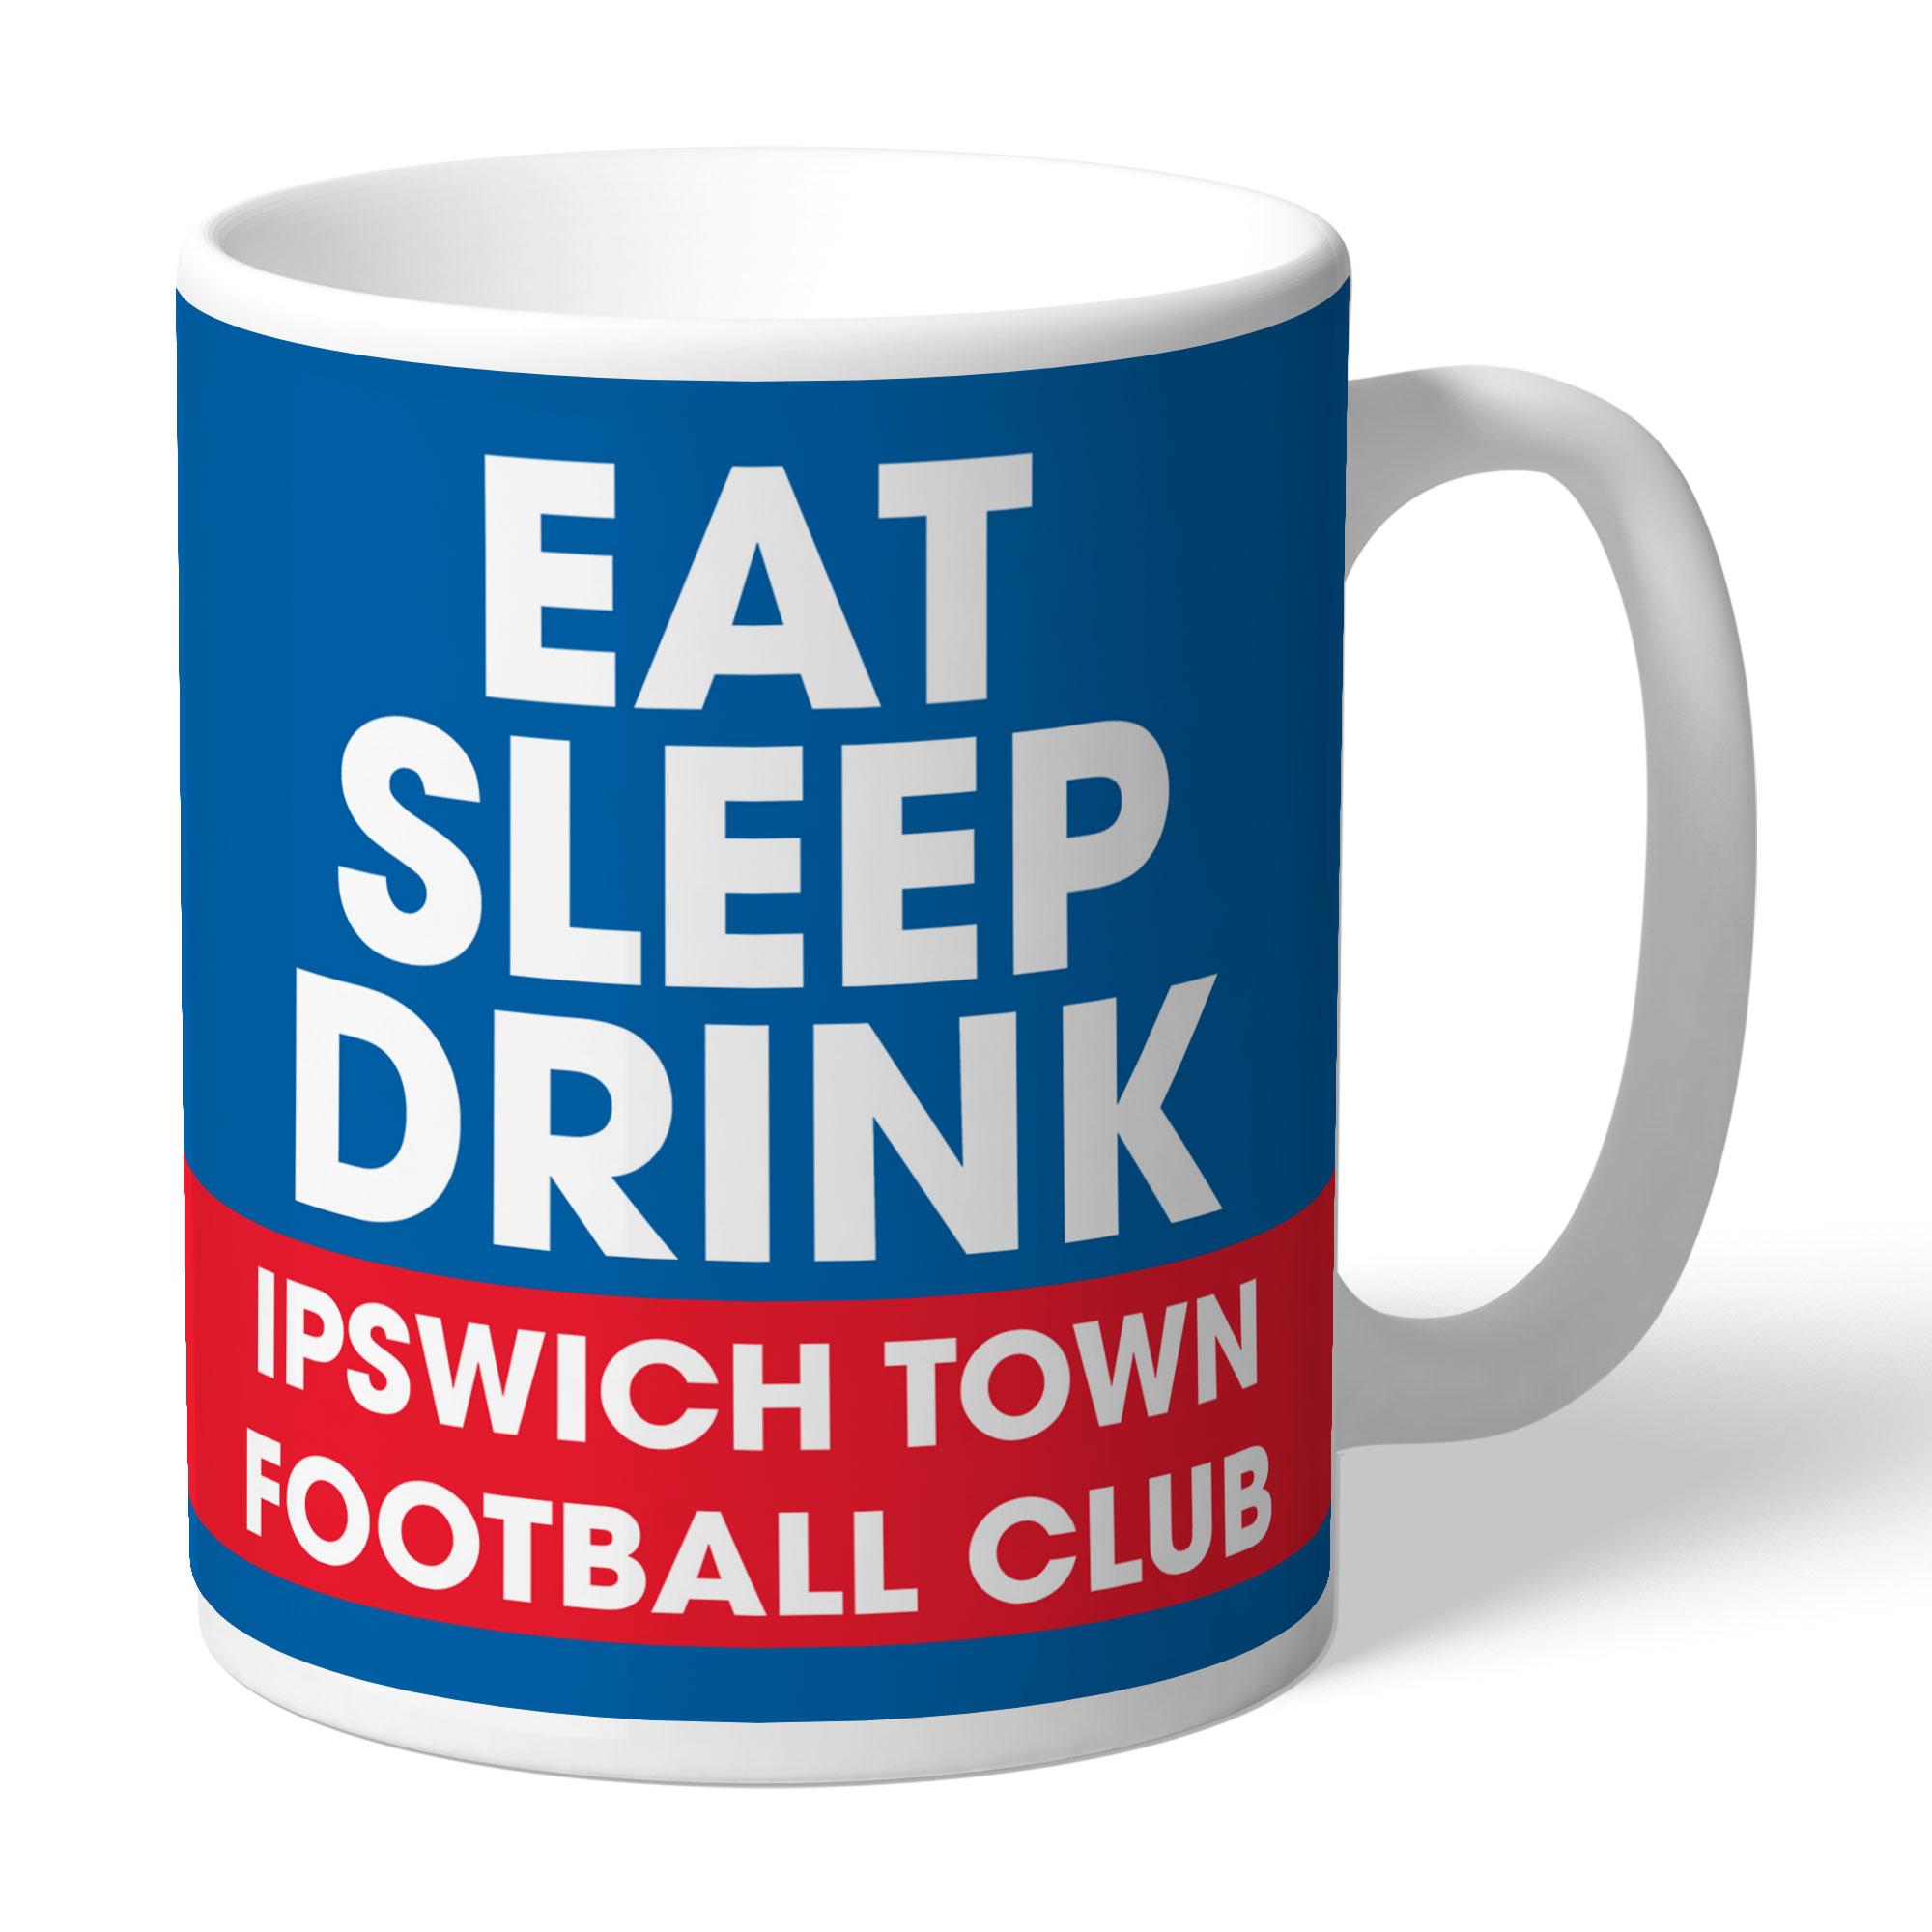 Ipswich Town FC Eat Sleep Drink Mug